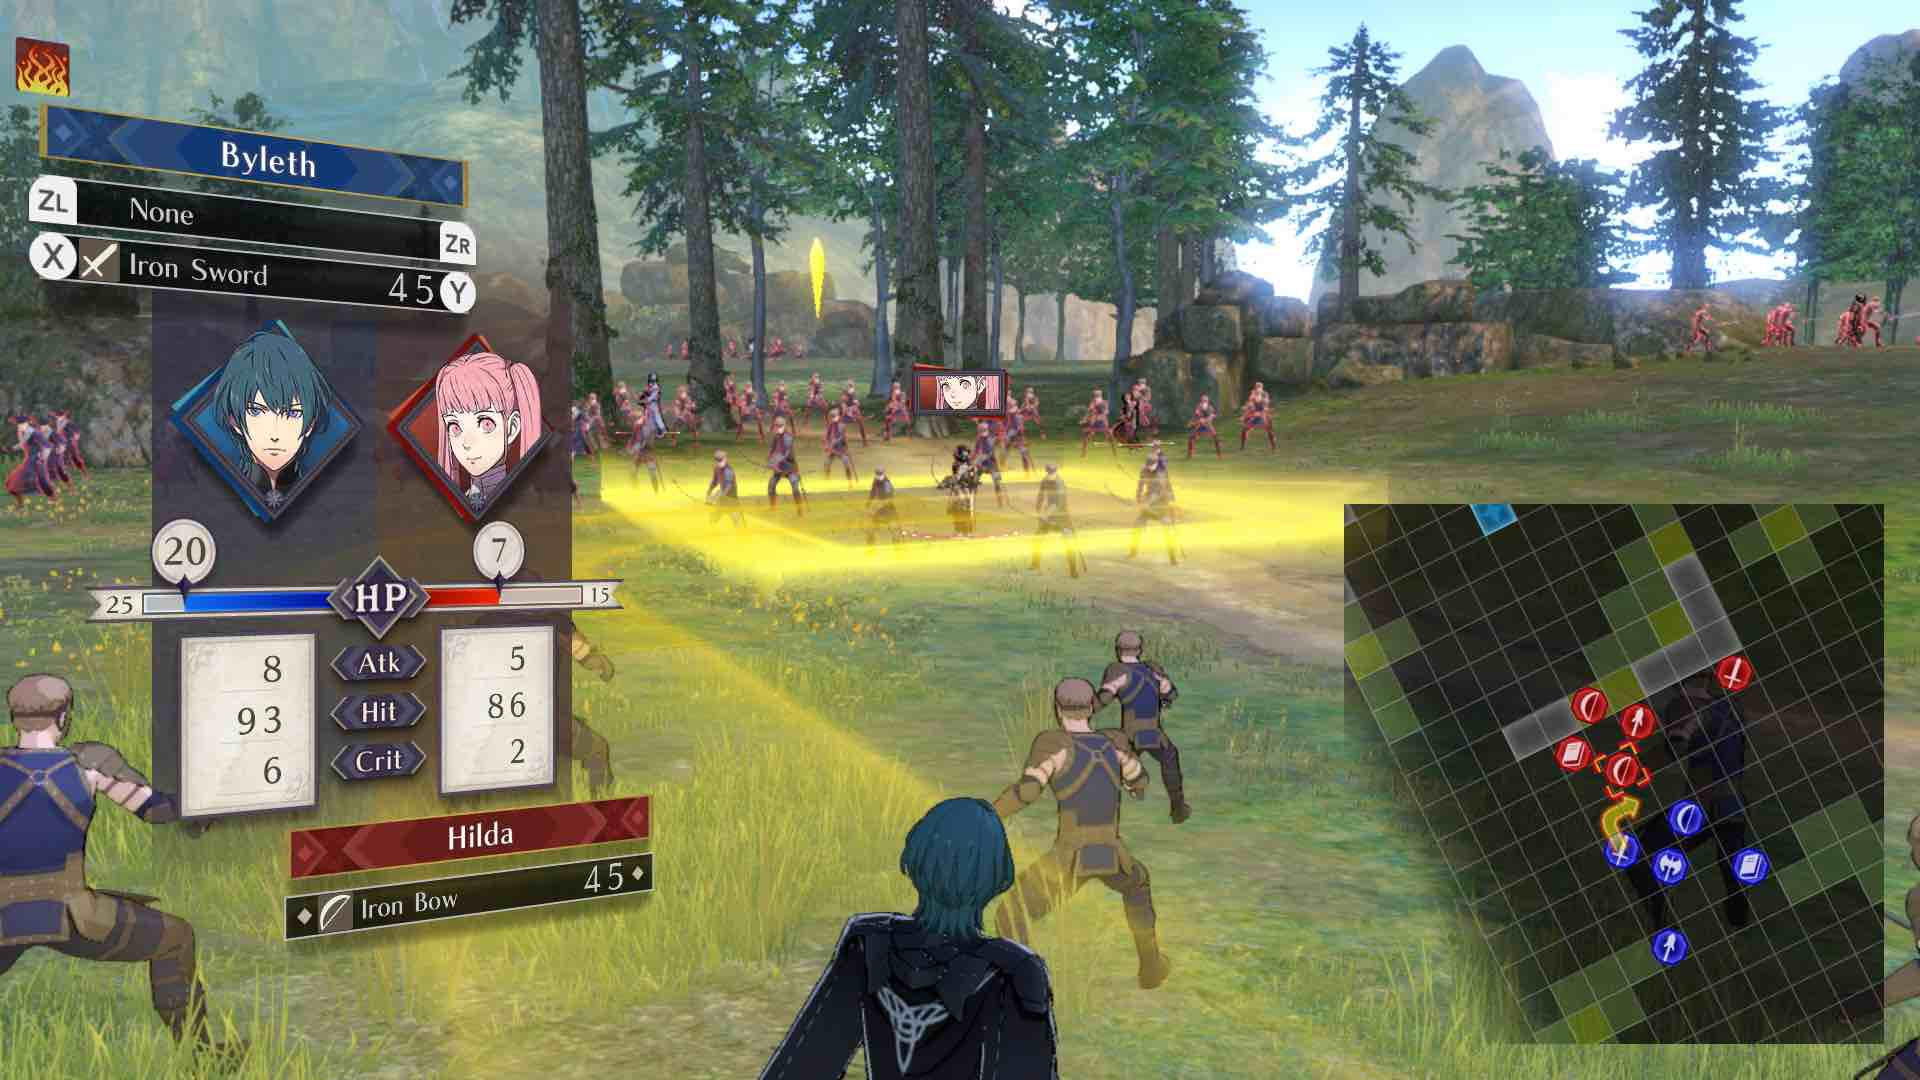 Fire Emblem: Three Houses E3 2018 Screenshot 12